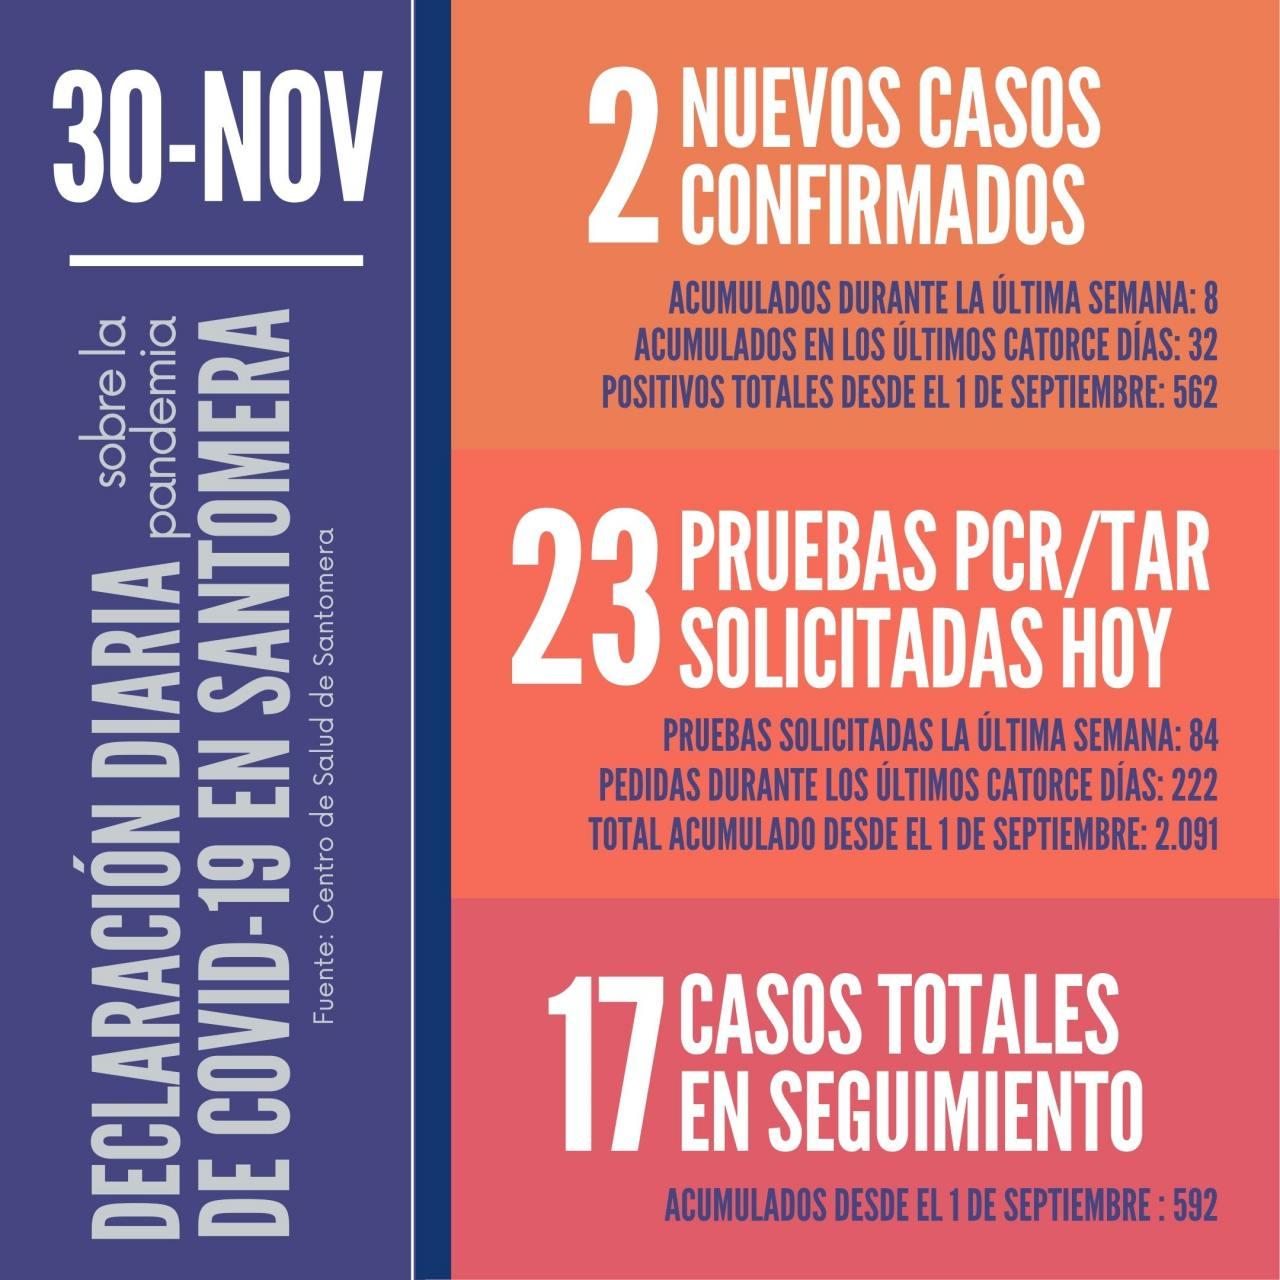 20201130_Datos-COVID-19-Santomera